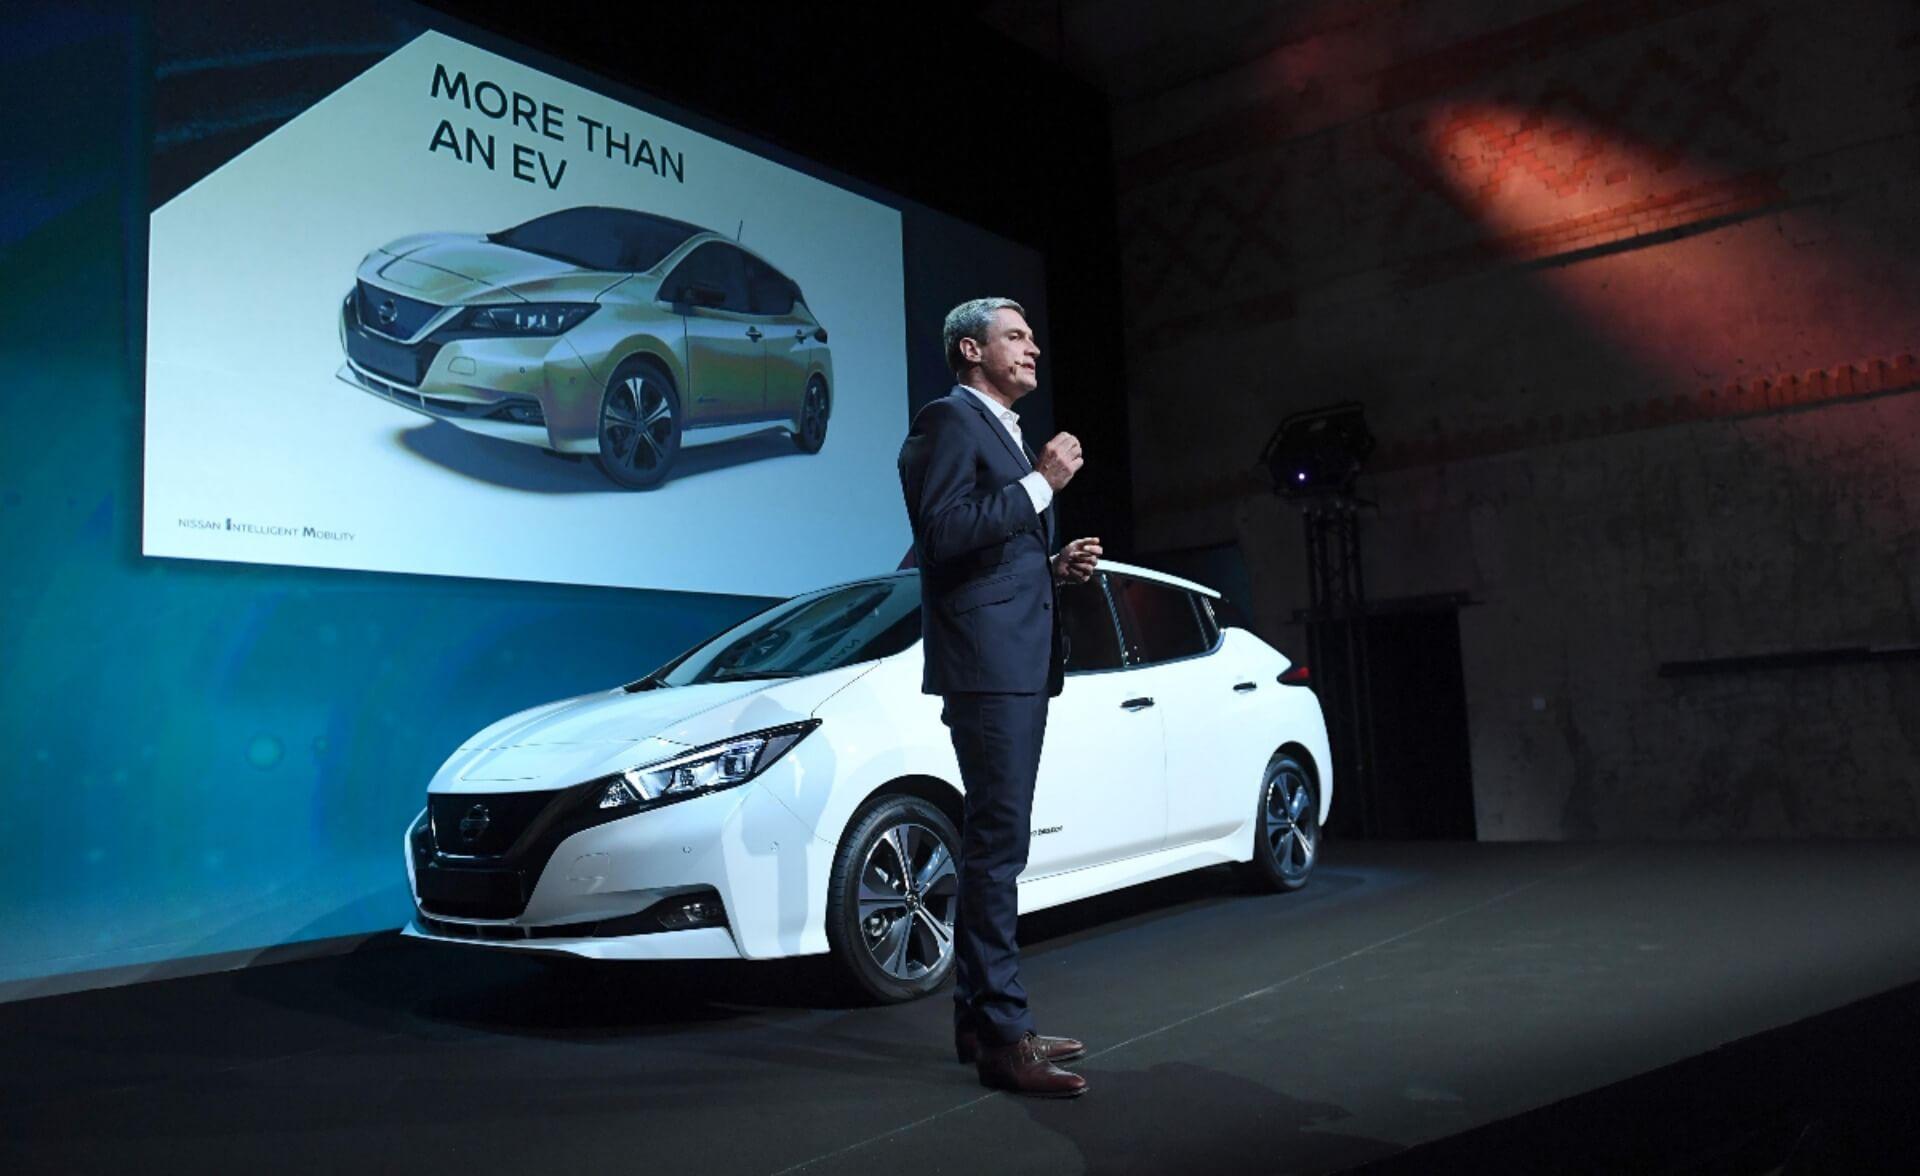 Презентация Nissan Leaf «2.ZERO» в Осло (Норвегия) 2 октября, 2017 года